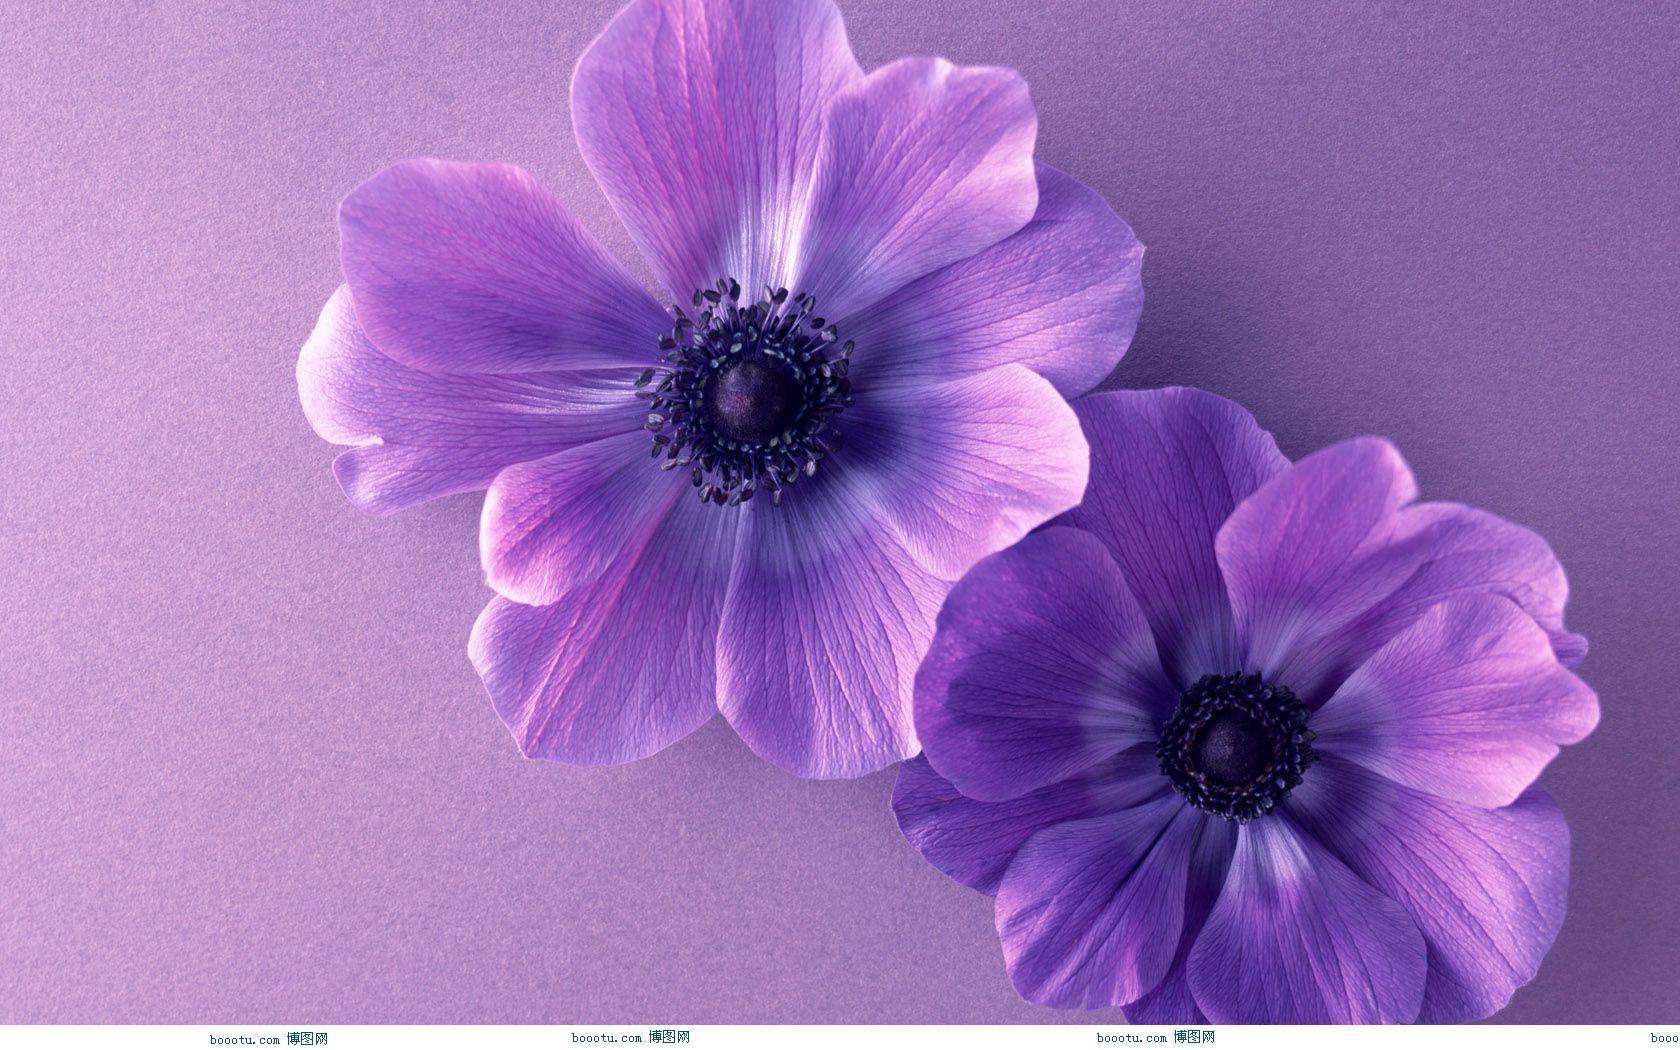 Image detail for Cute Flower Wallpaper 1680X1050